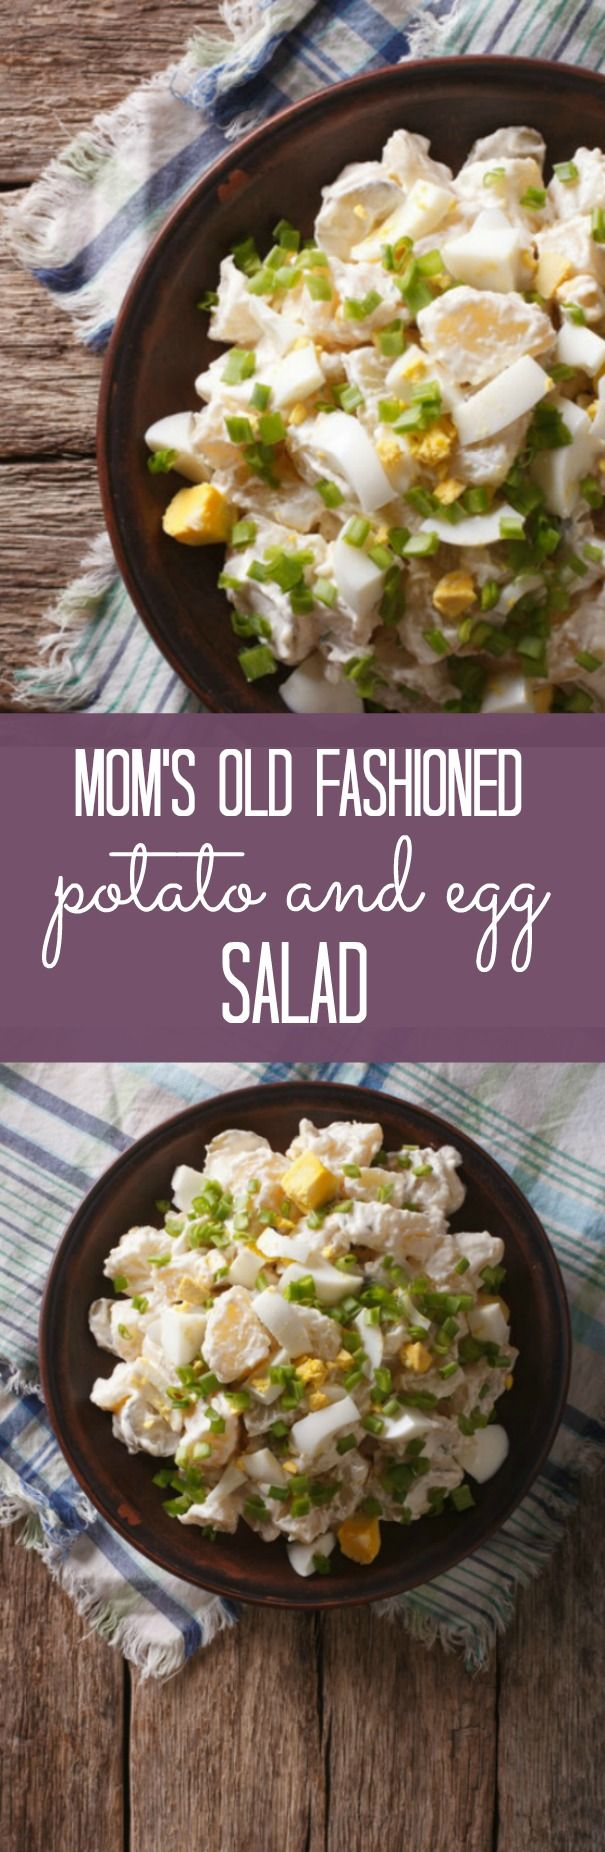 1000+ ideas about Potato Egg Salad on Pinterest | Potato salad ...